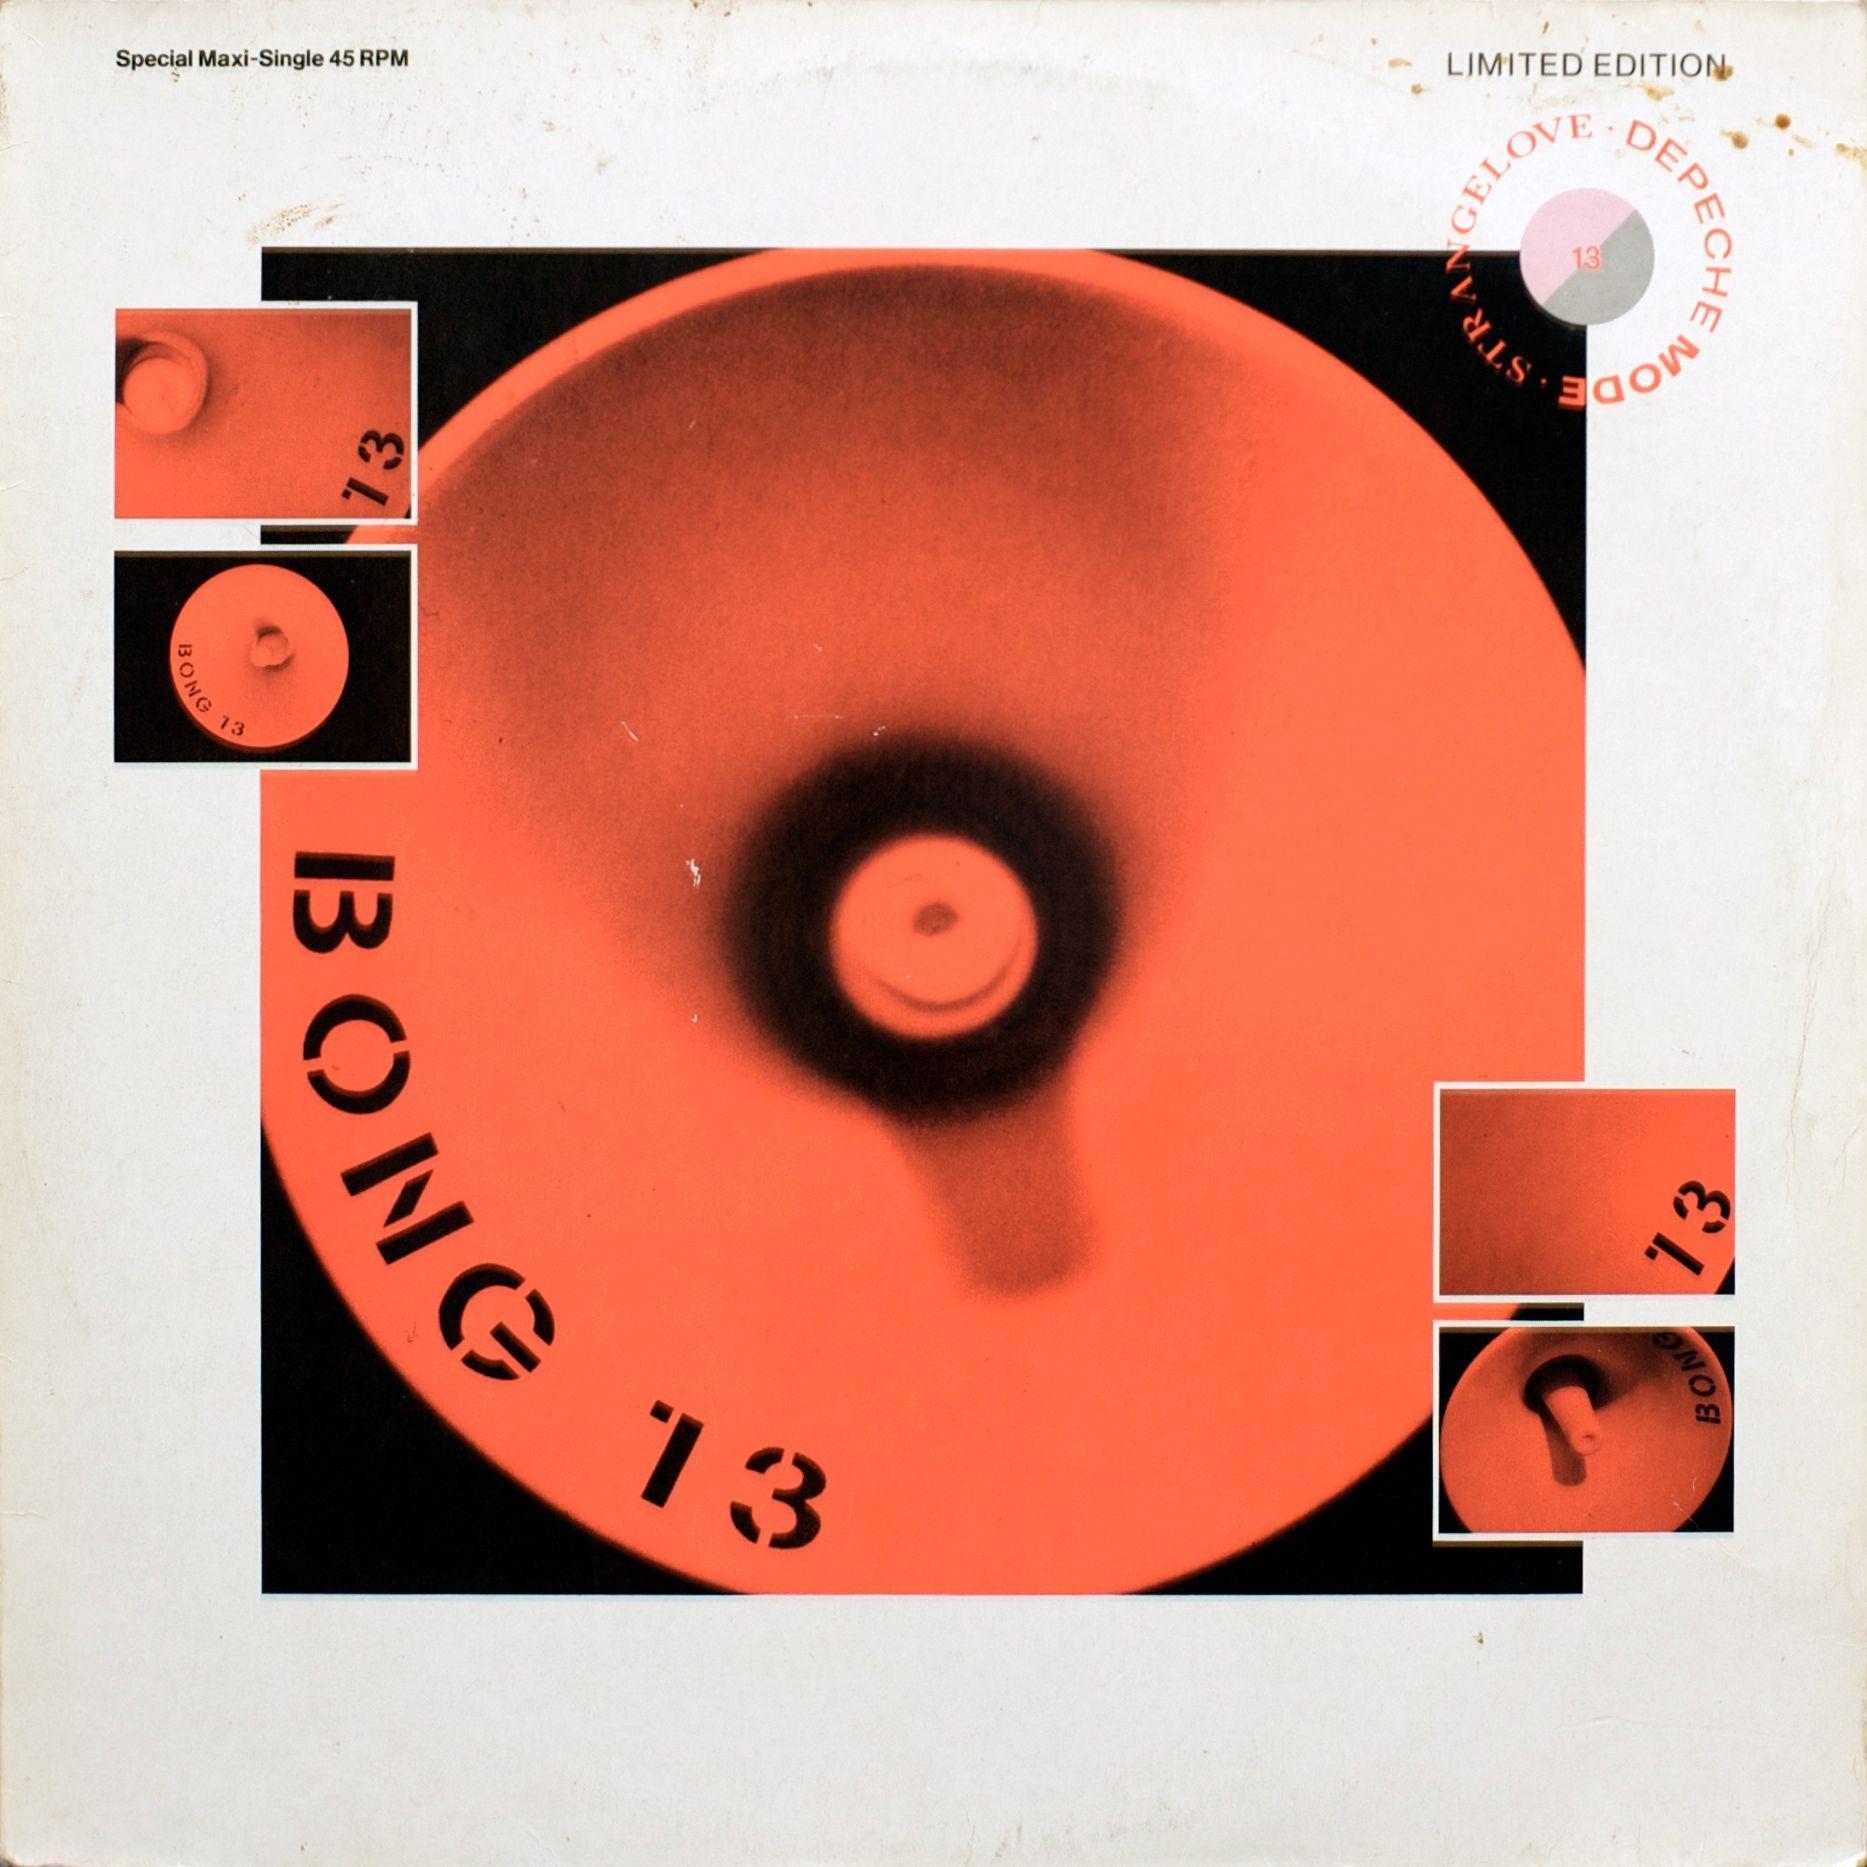 Strangelove Maxi Single Depeche Mode Cool Album Covers Music Album Art